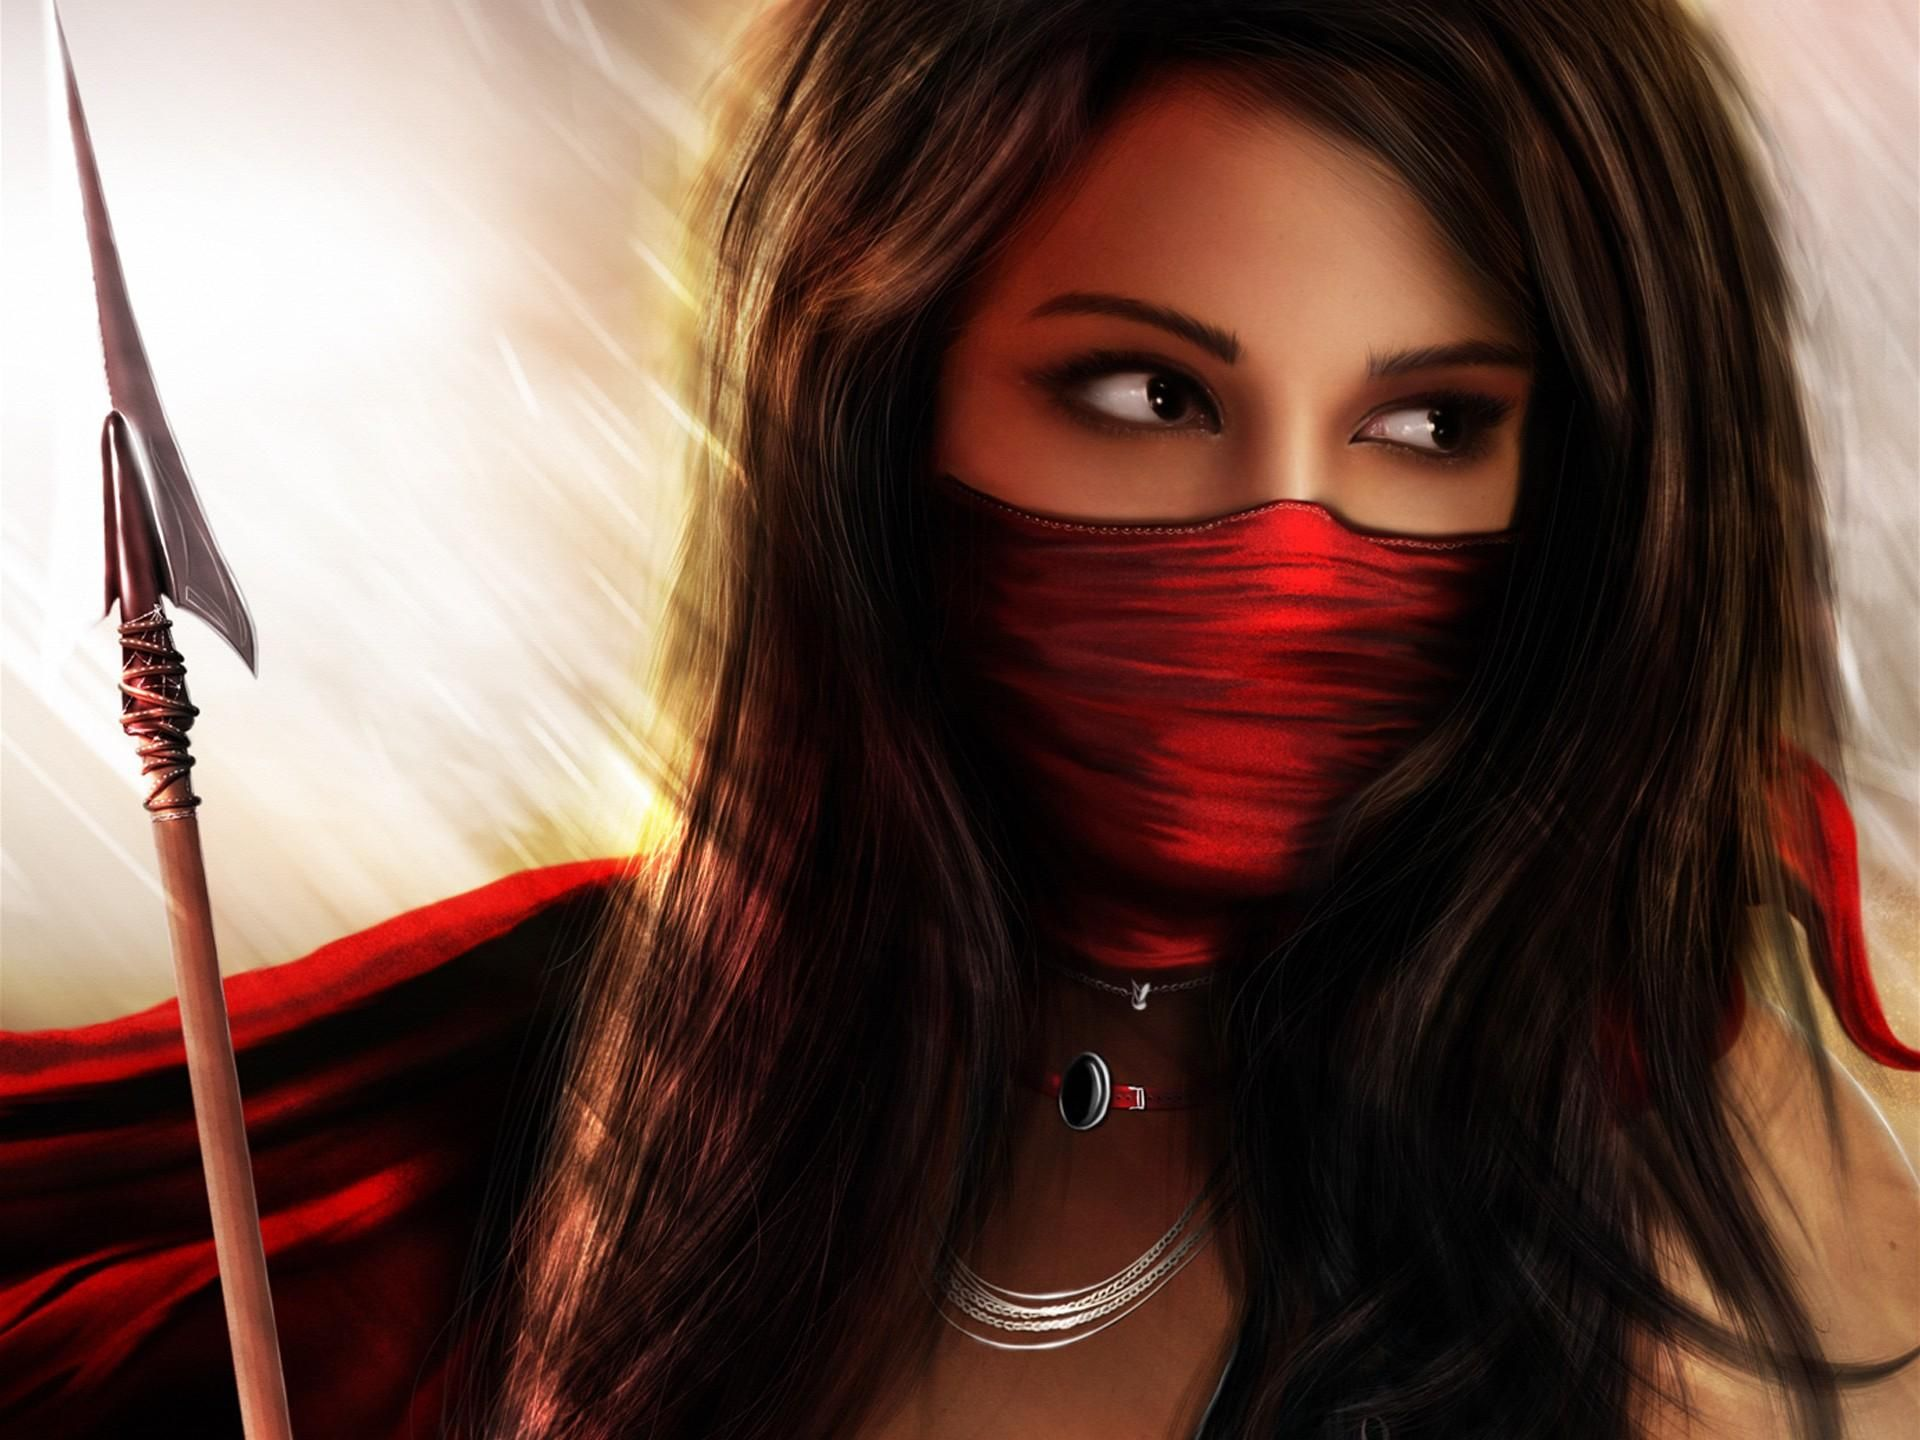 Download Hd Wallpapers Of Beautiful Amazon Warrior Girl Free Download High Quality And Widescreen Resolutions Deskt Ninja Girl Warriors Wallpaper Fantasy Girl